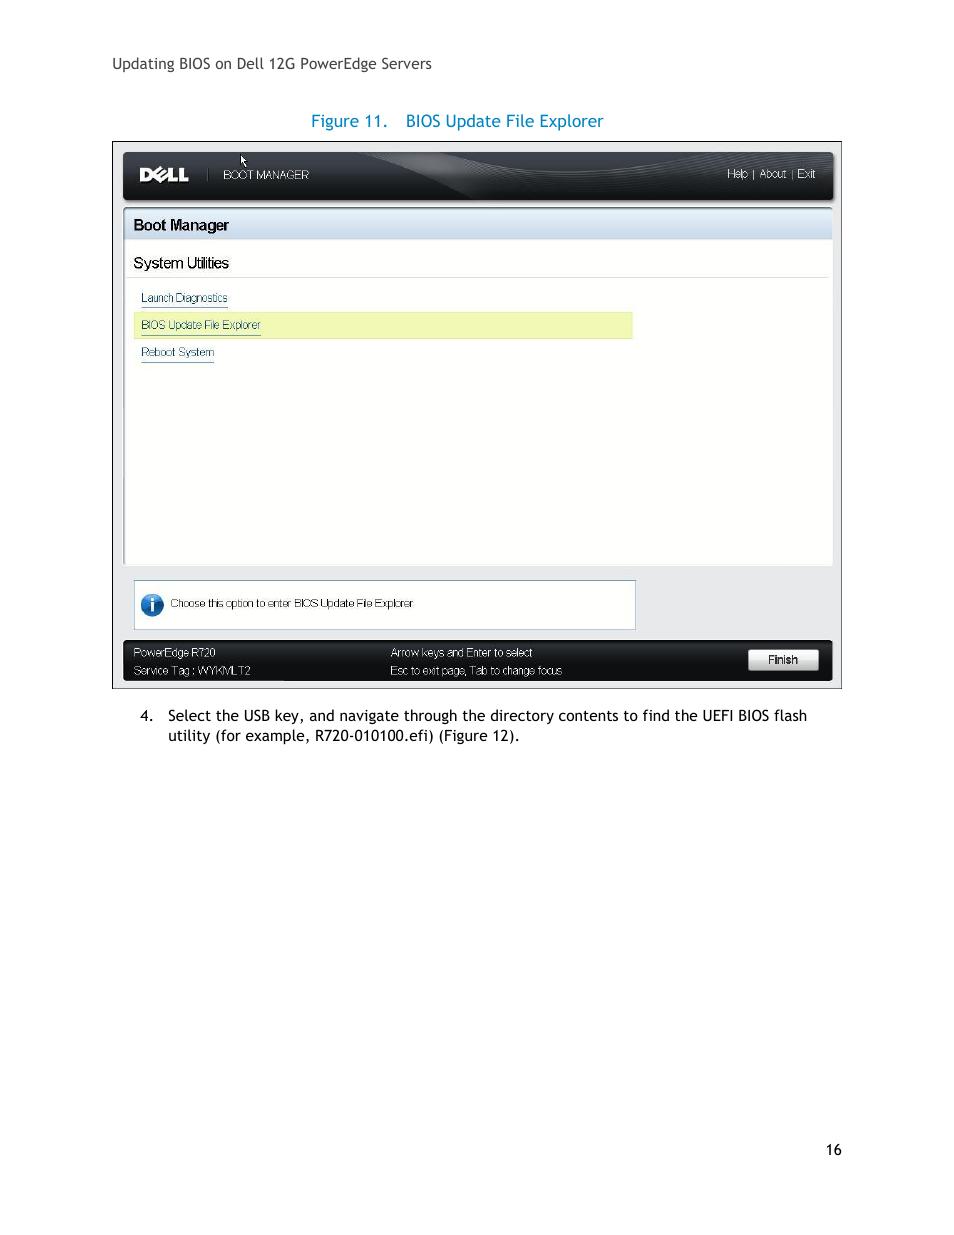 Figure 11, Bios update file explorer | Dell POWEREDGE R620